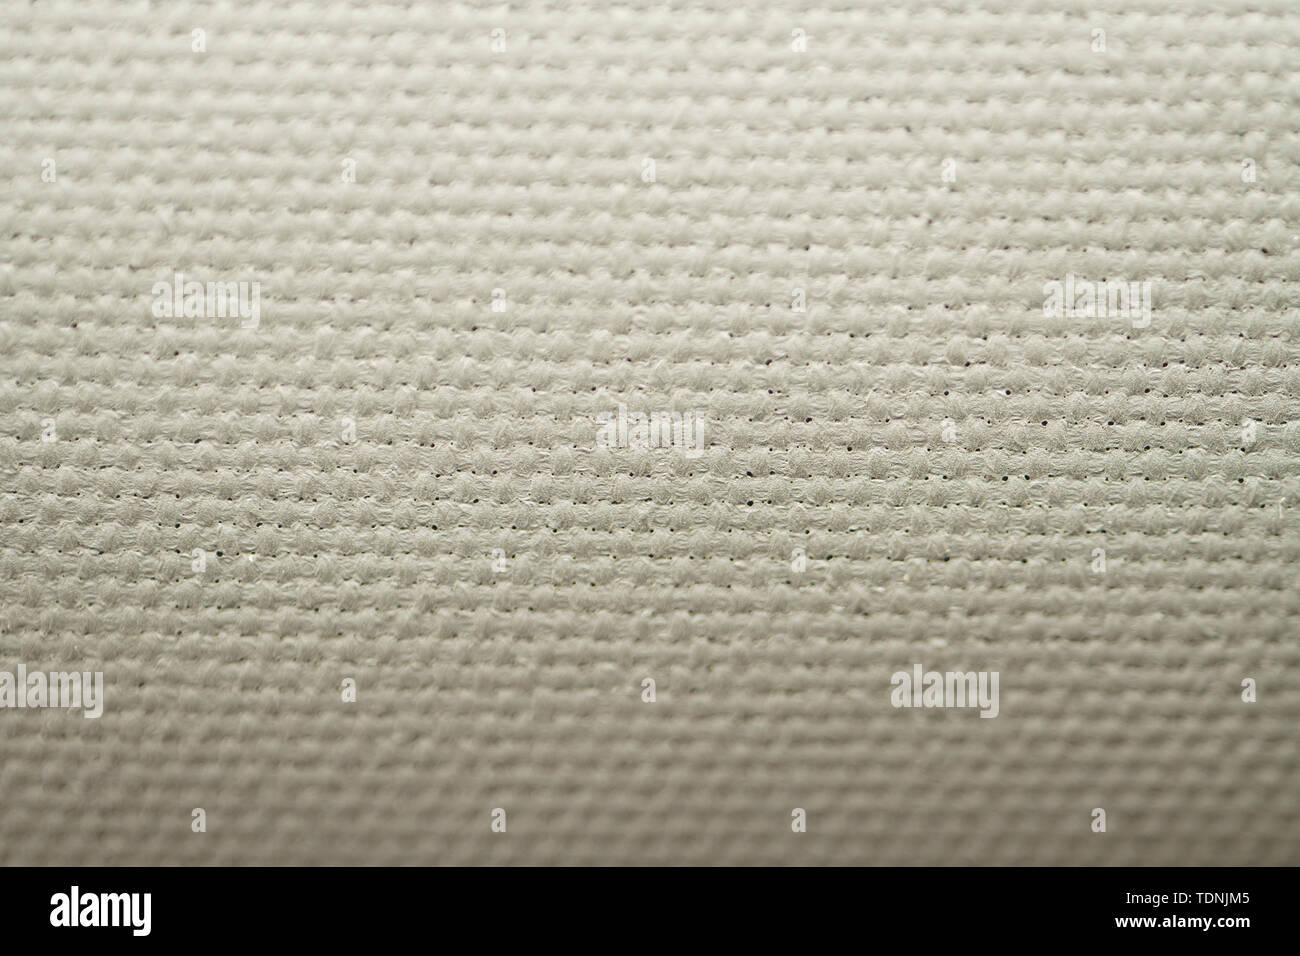 White Nylon Synthetic Textile Material Background Texture Stock